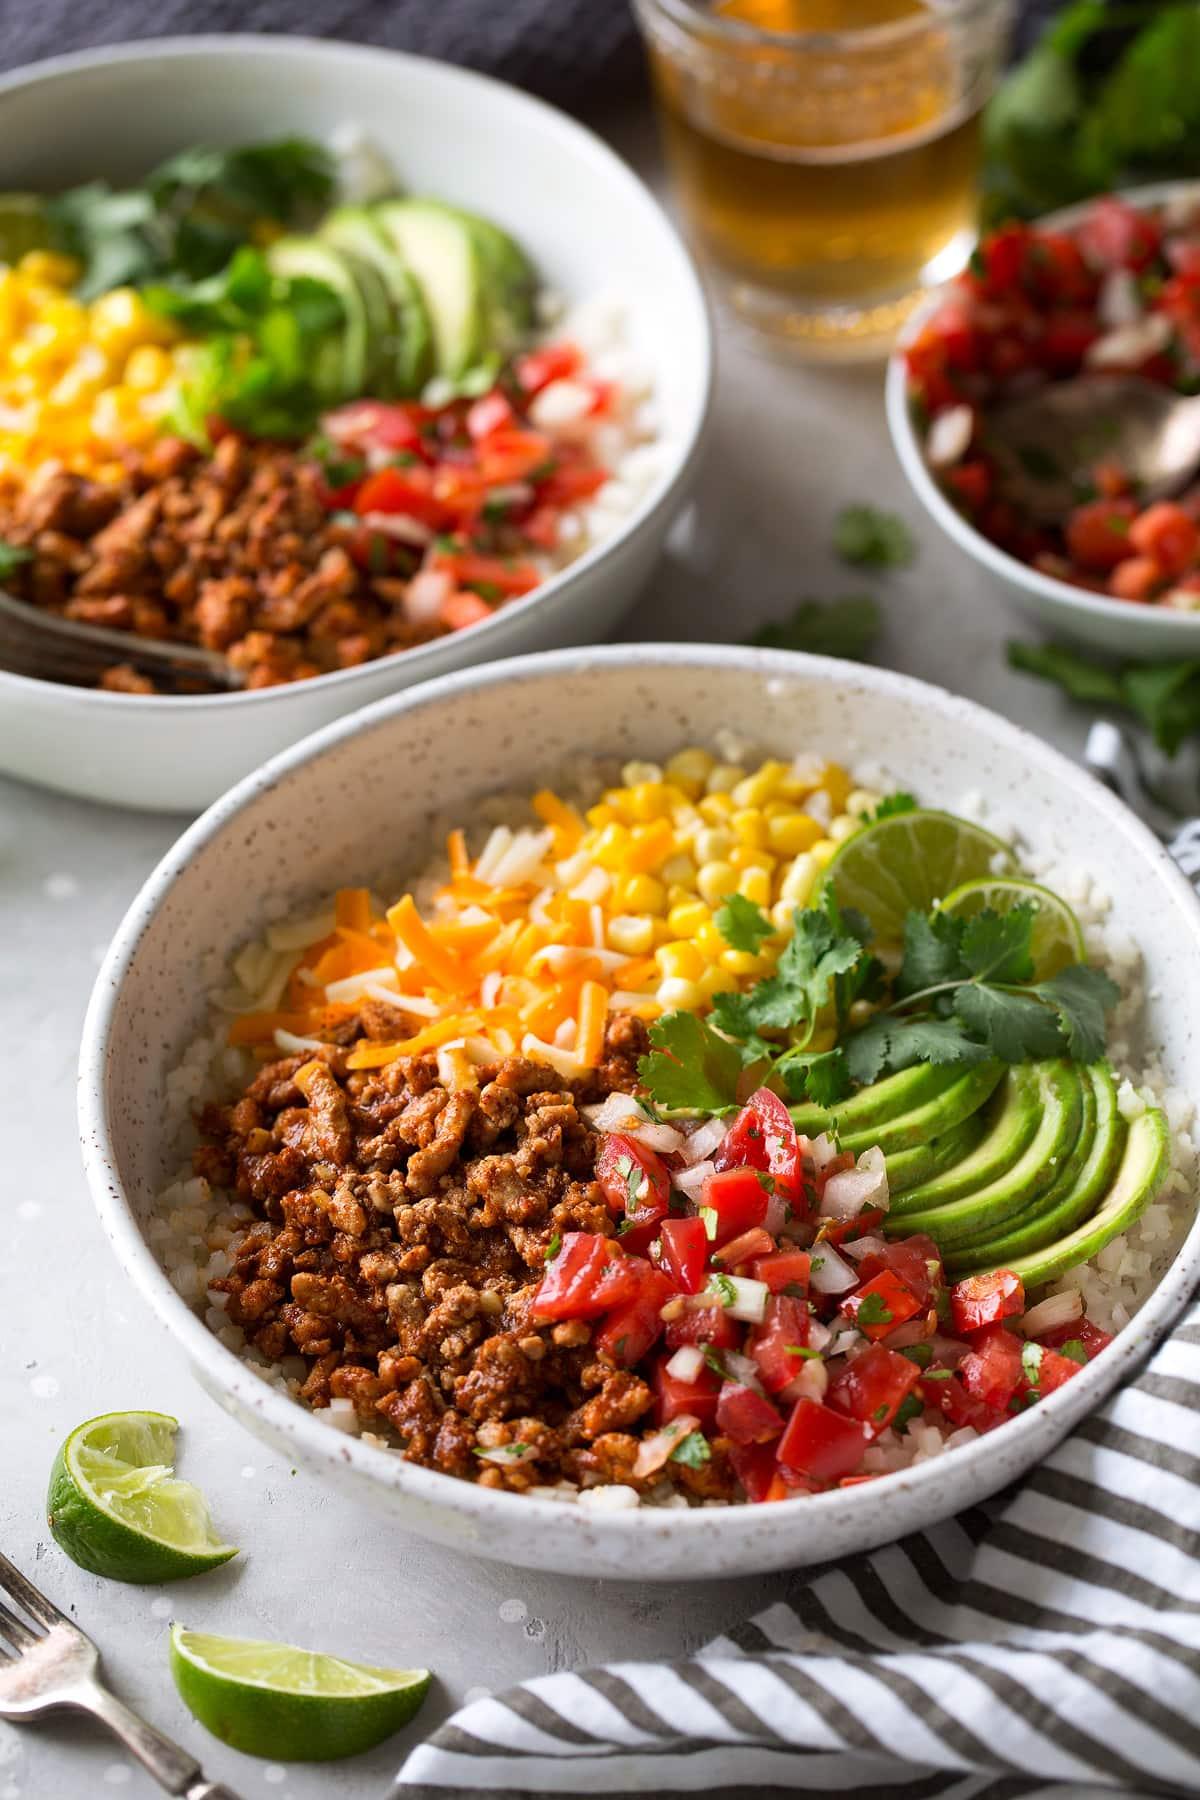 Turkey Taco Meal Prep Bowls